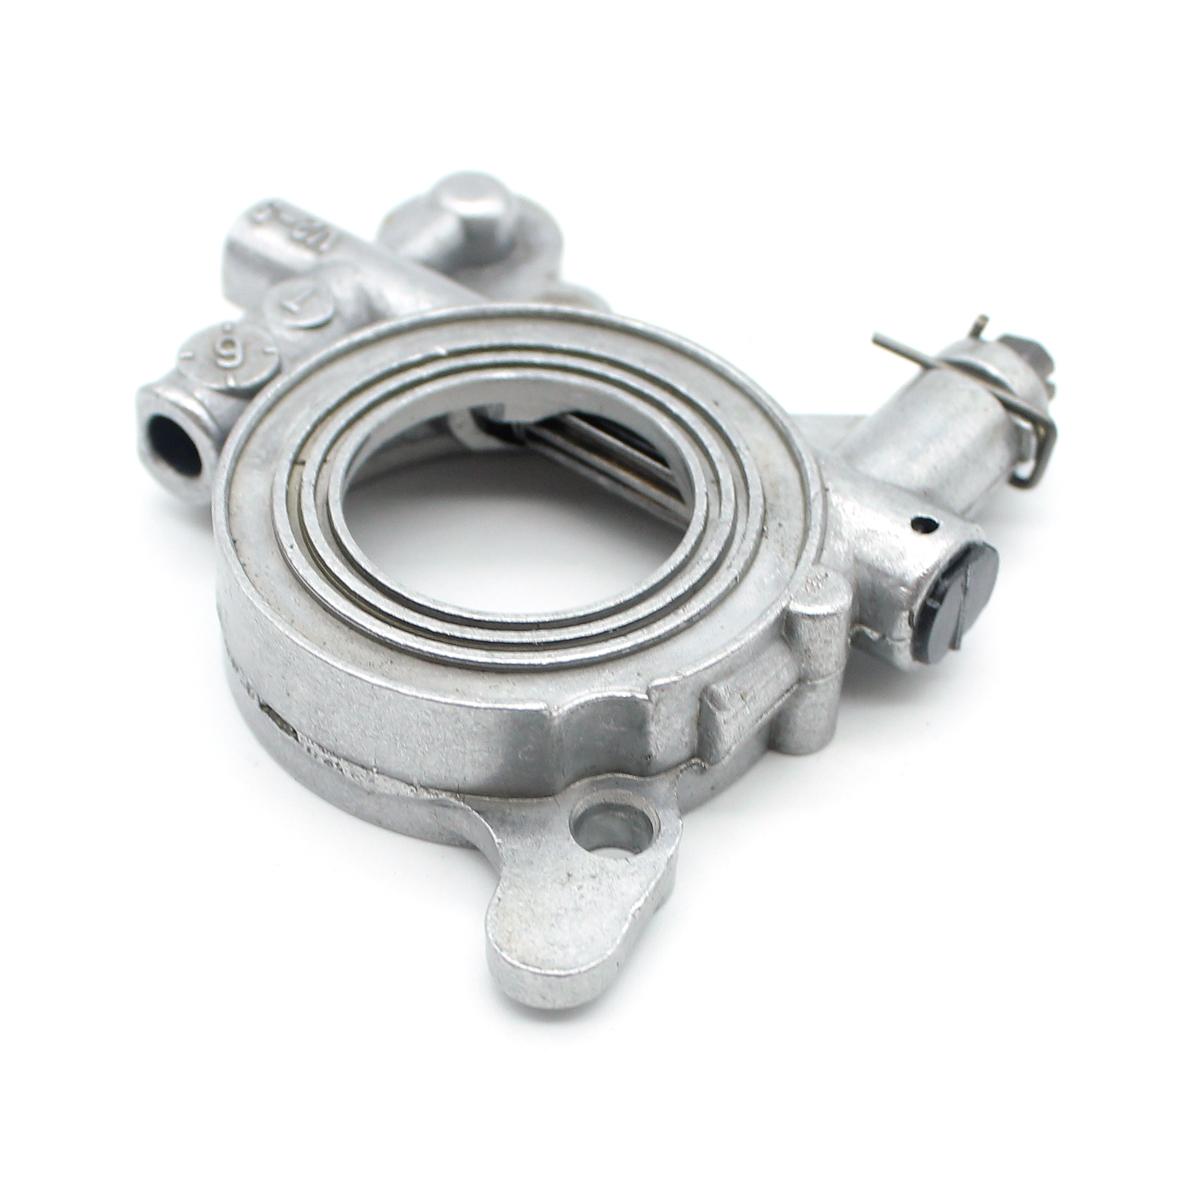 Oil Pump For Husqvarna 503521305 362 365 371 372 503521301 New